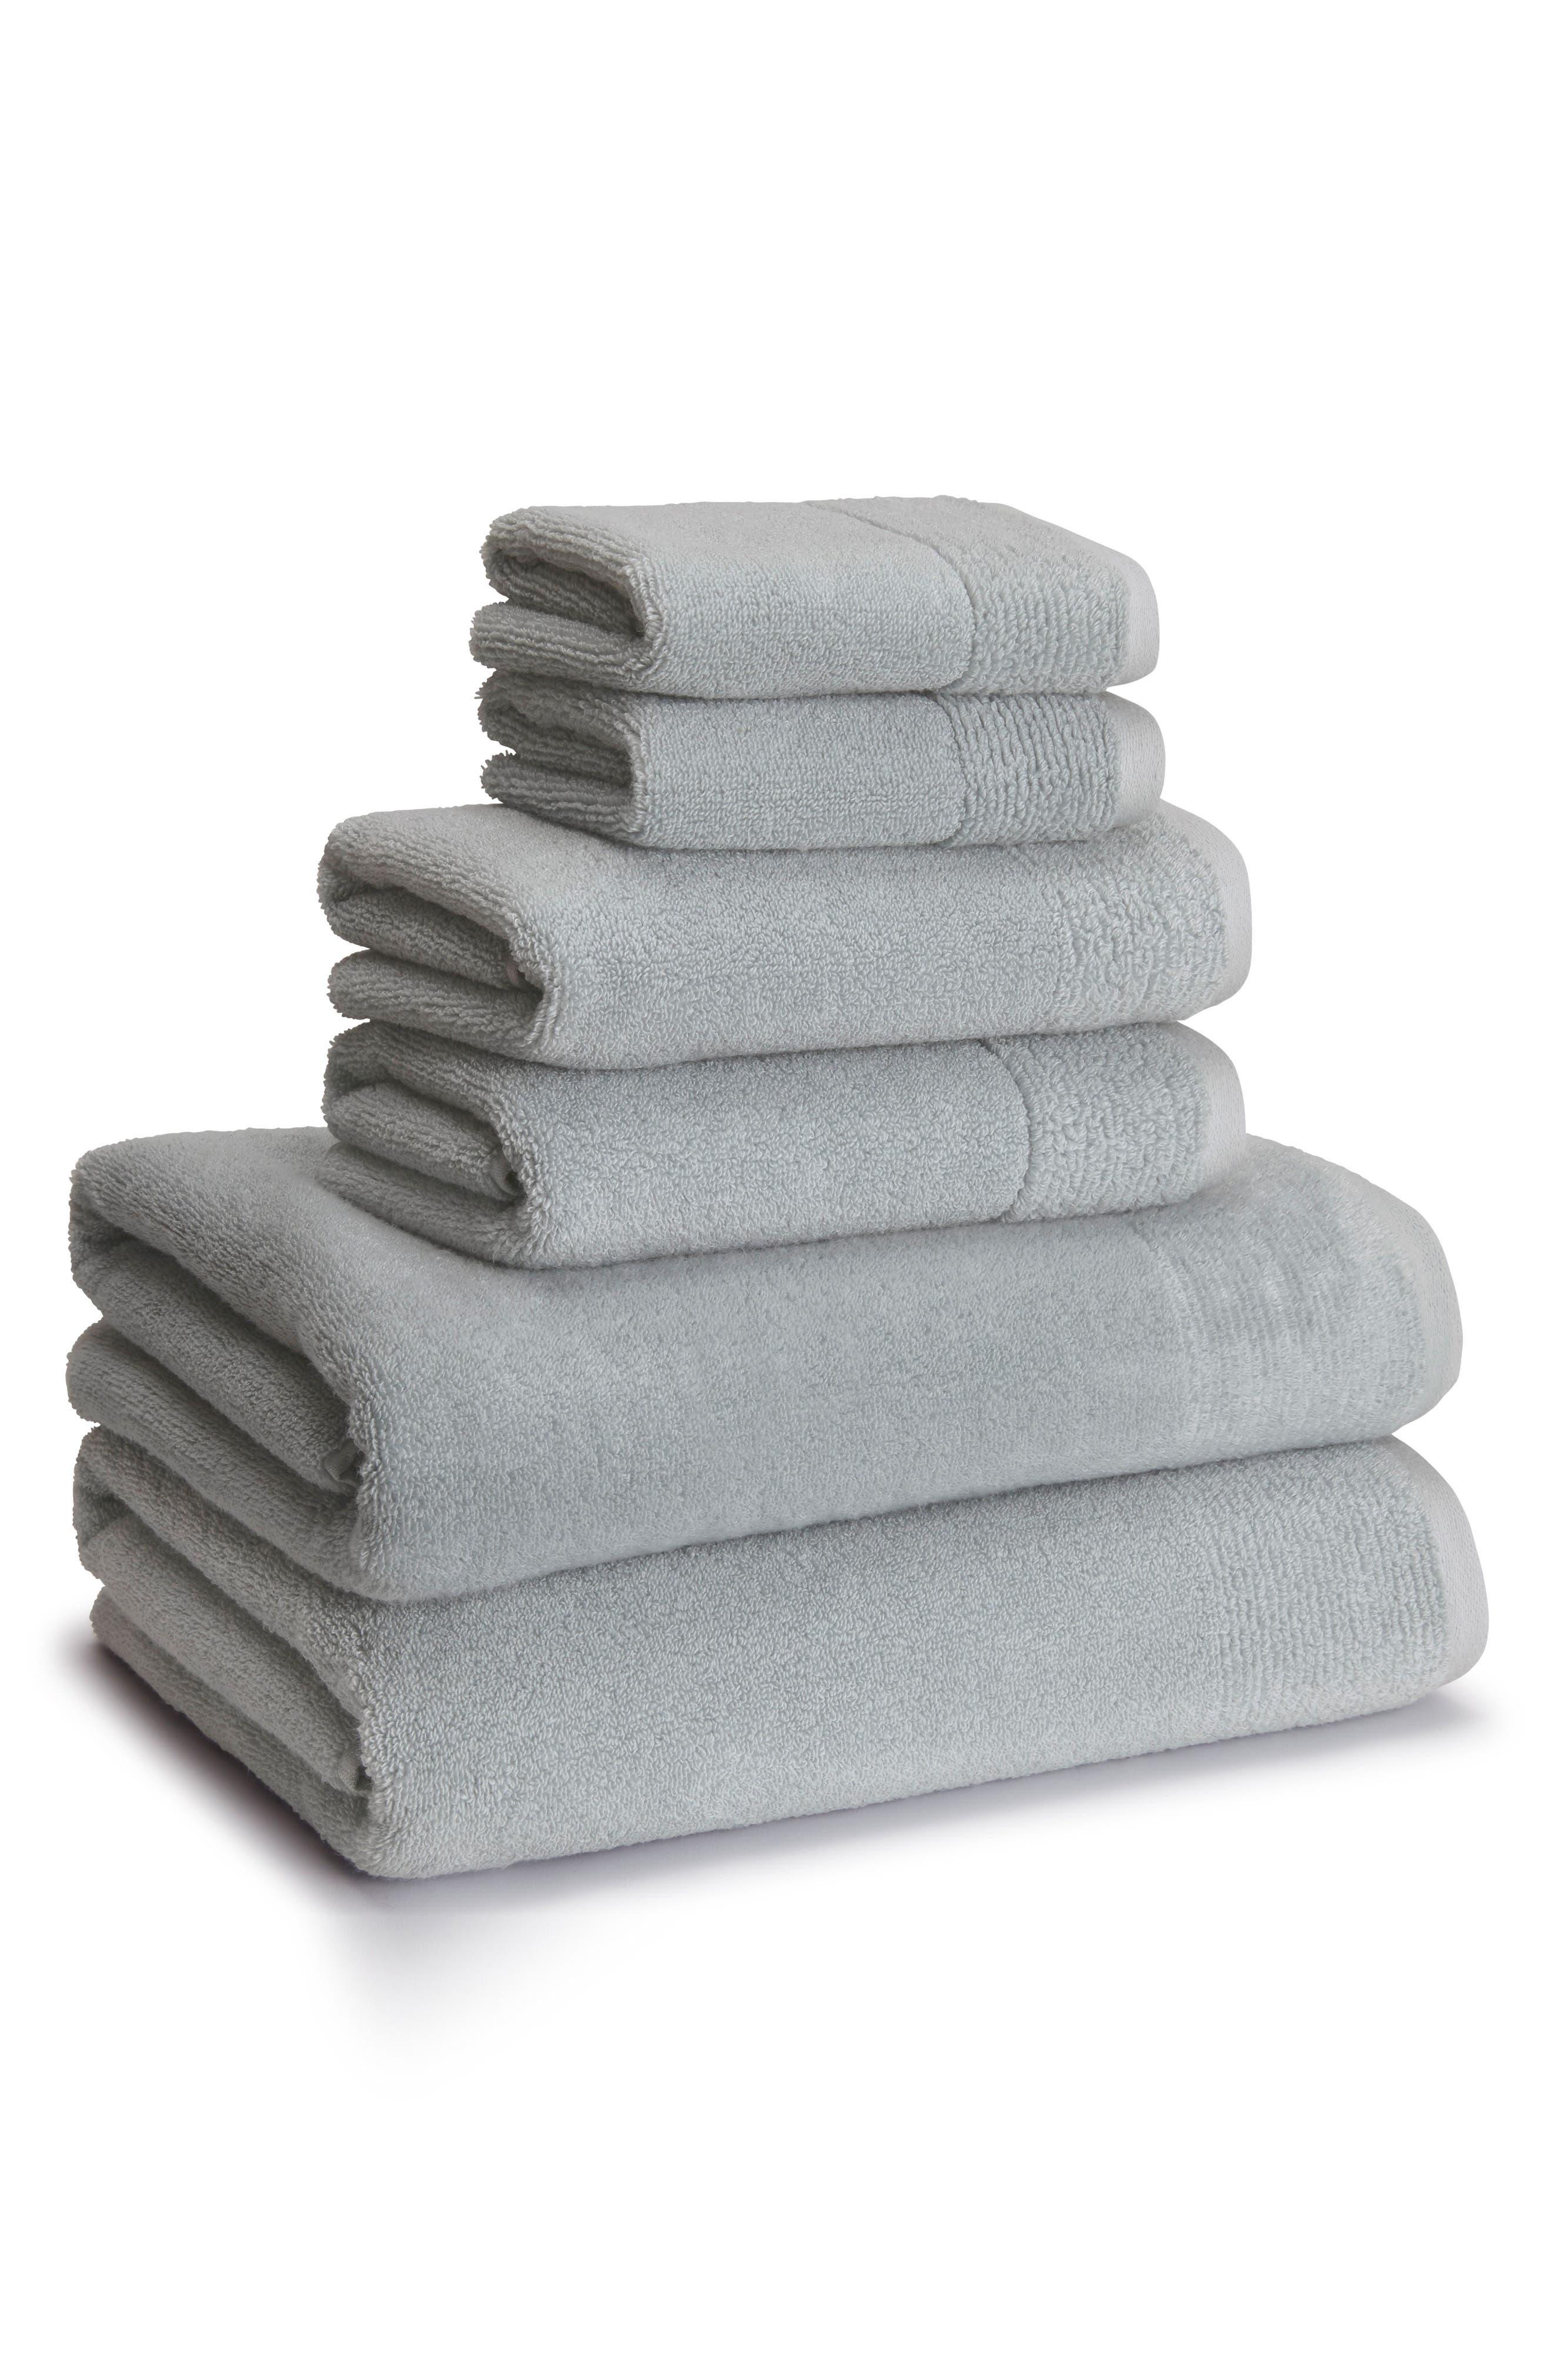 KASSATEX Kyoto Bath Towel